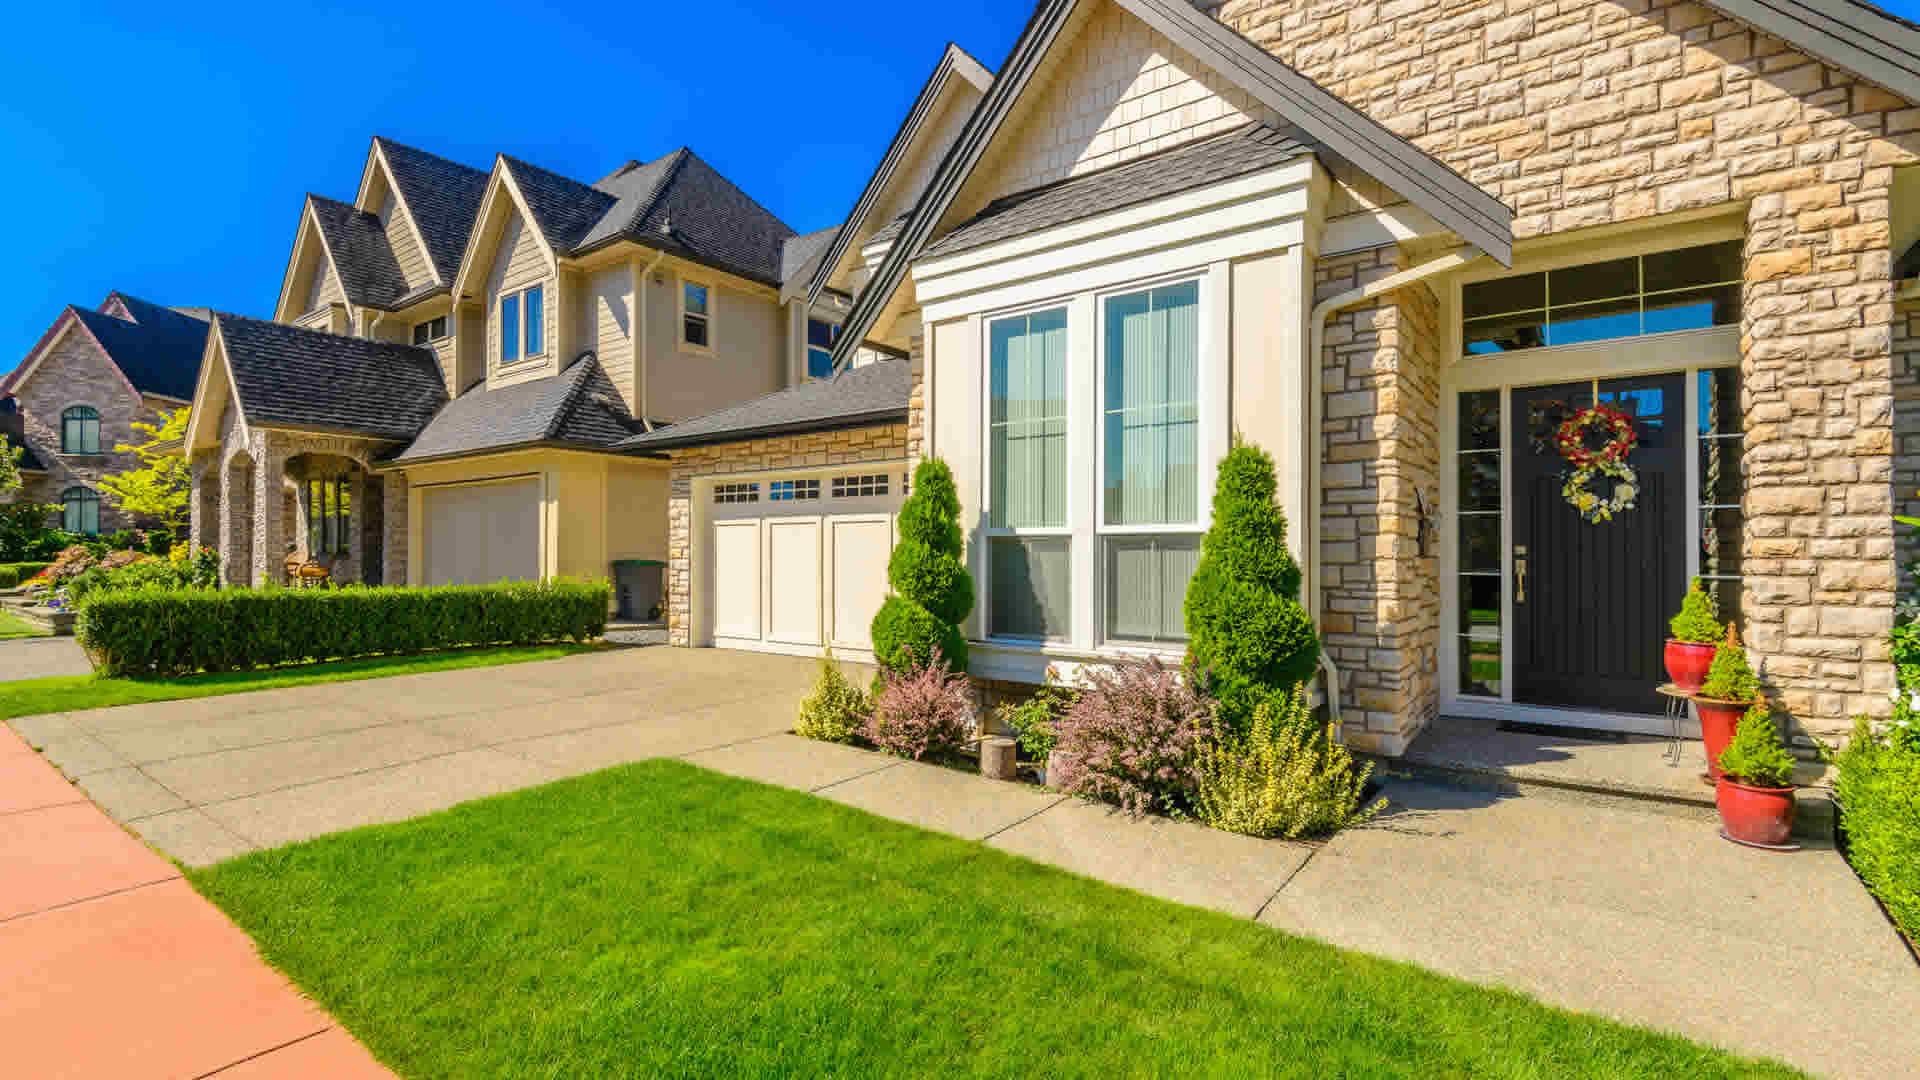 Montverde FL Professional Home Inspection